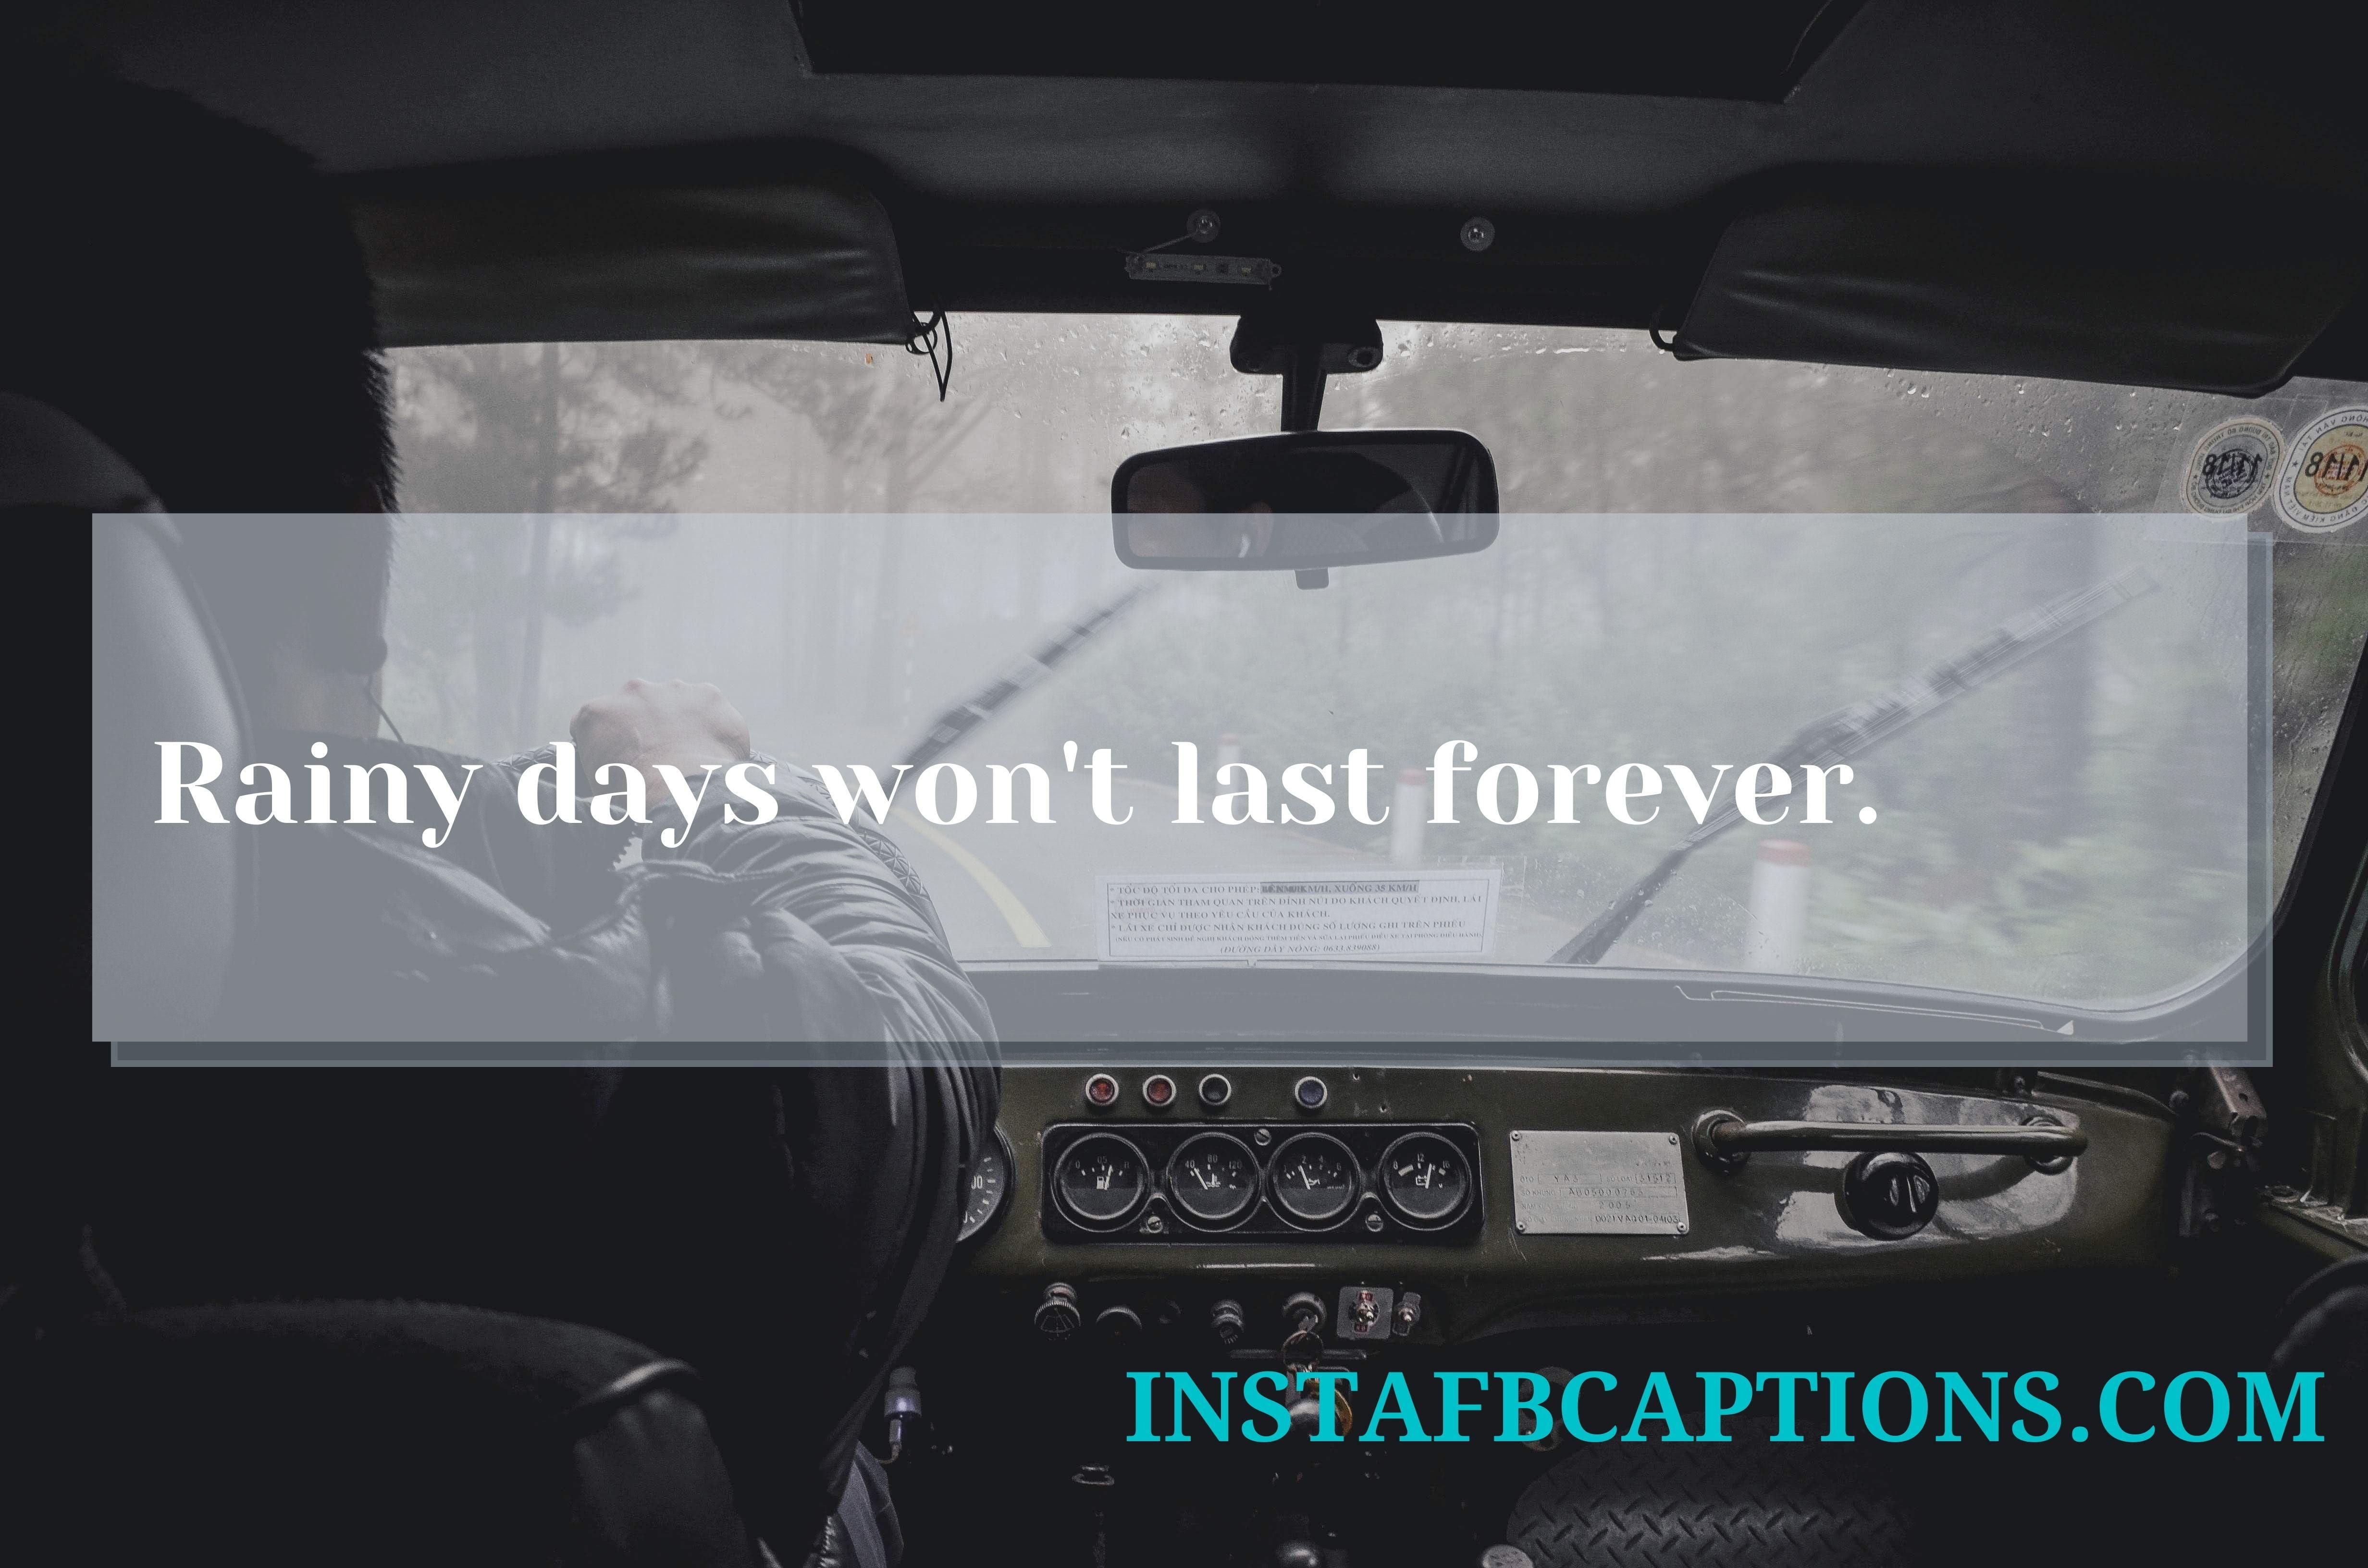 Driving In Rain Captions  - Driving in Rain Captions - 120+ RAIN & MONSOON Instagram Captions 2021